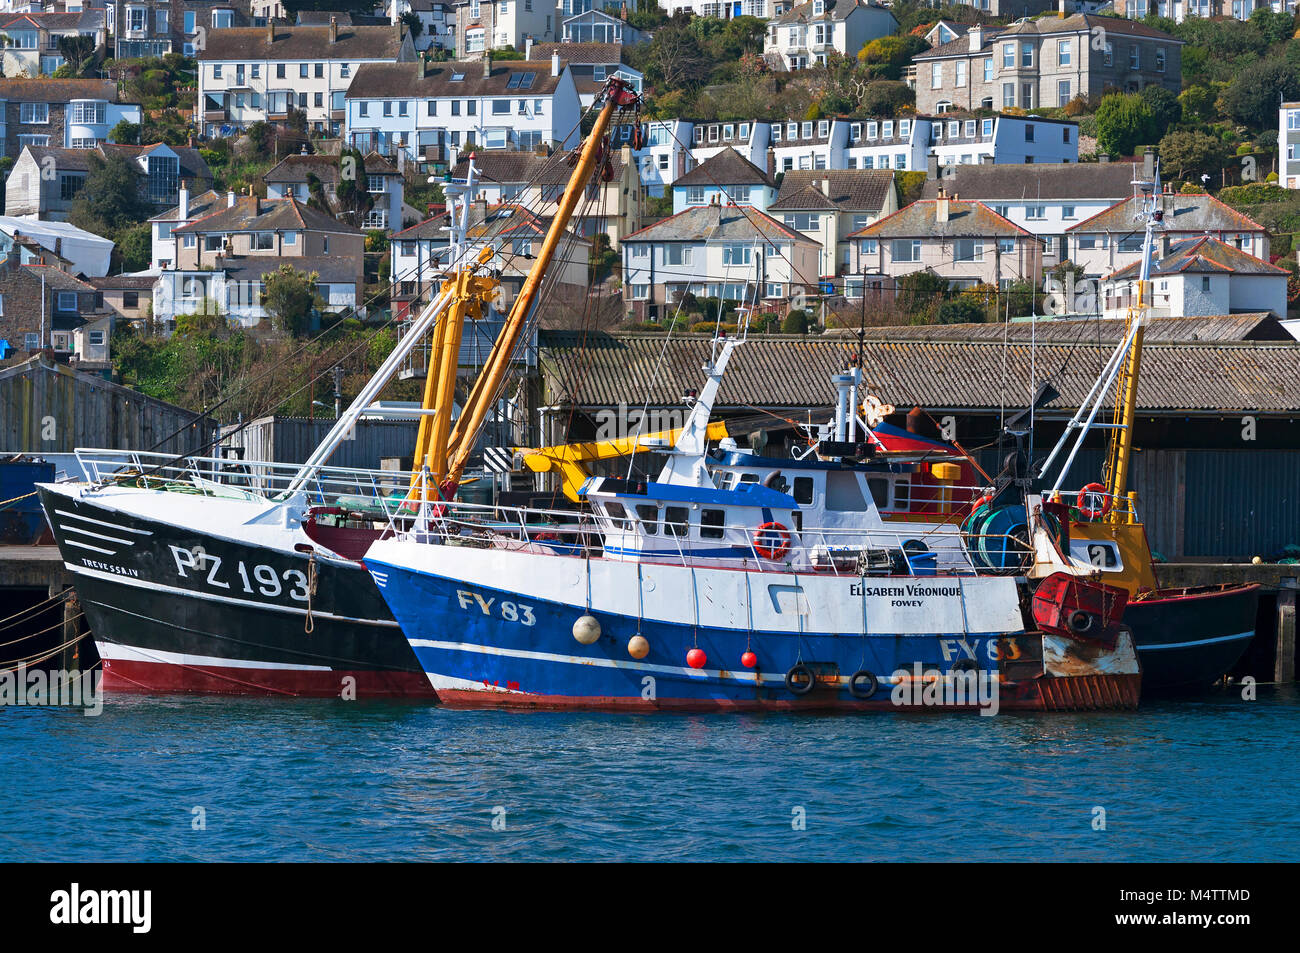 cornish fishing industry trawlers in the cornish harbour port of newlyn, penzance, cornwall, england, britain, uk. - Stock Image